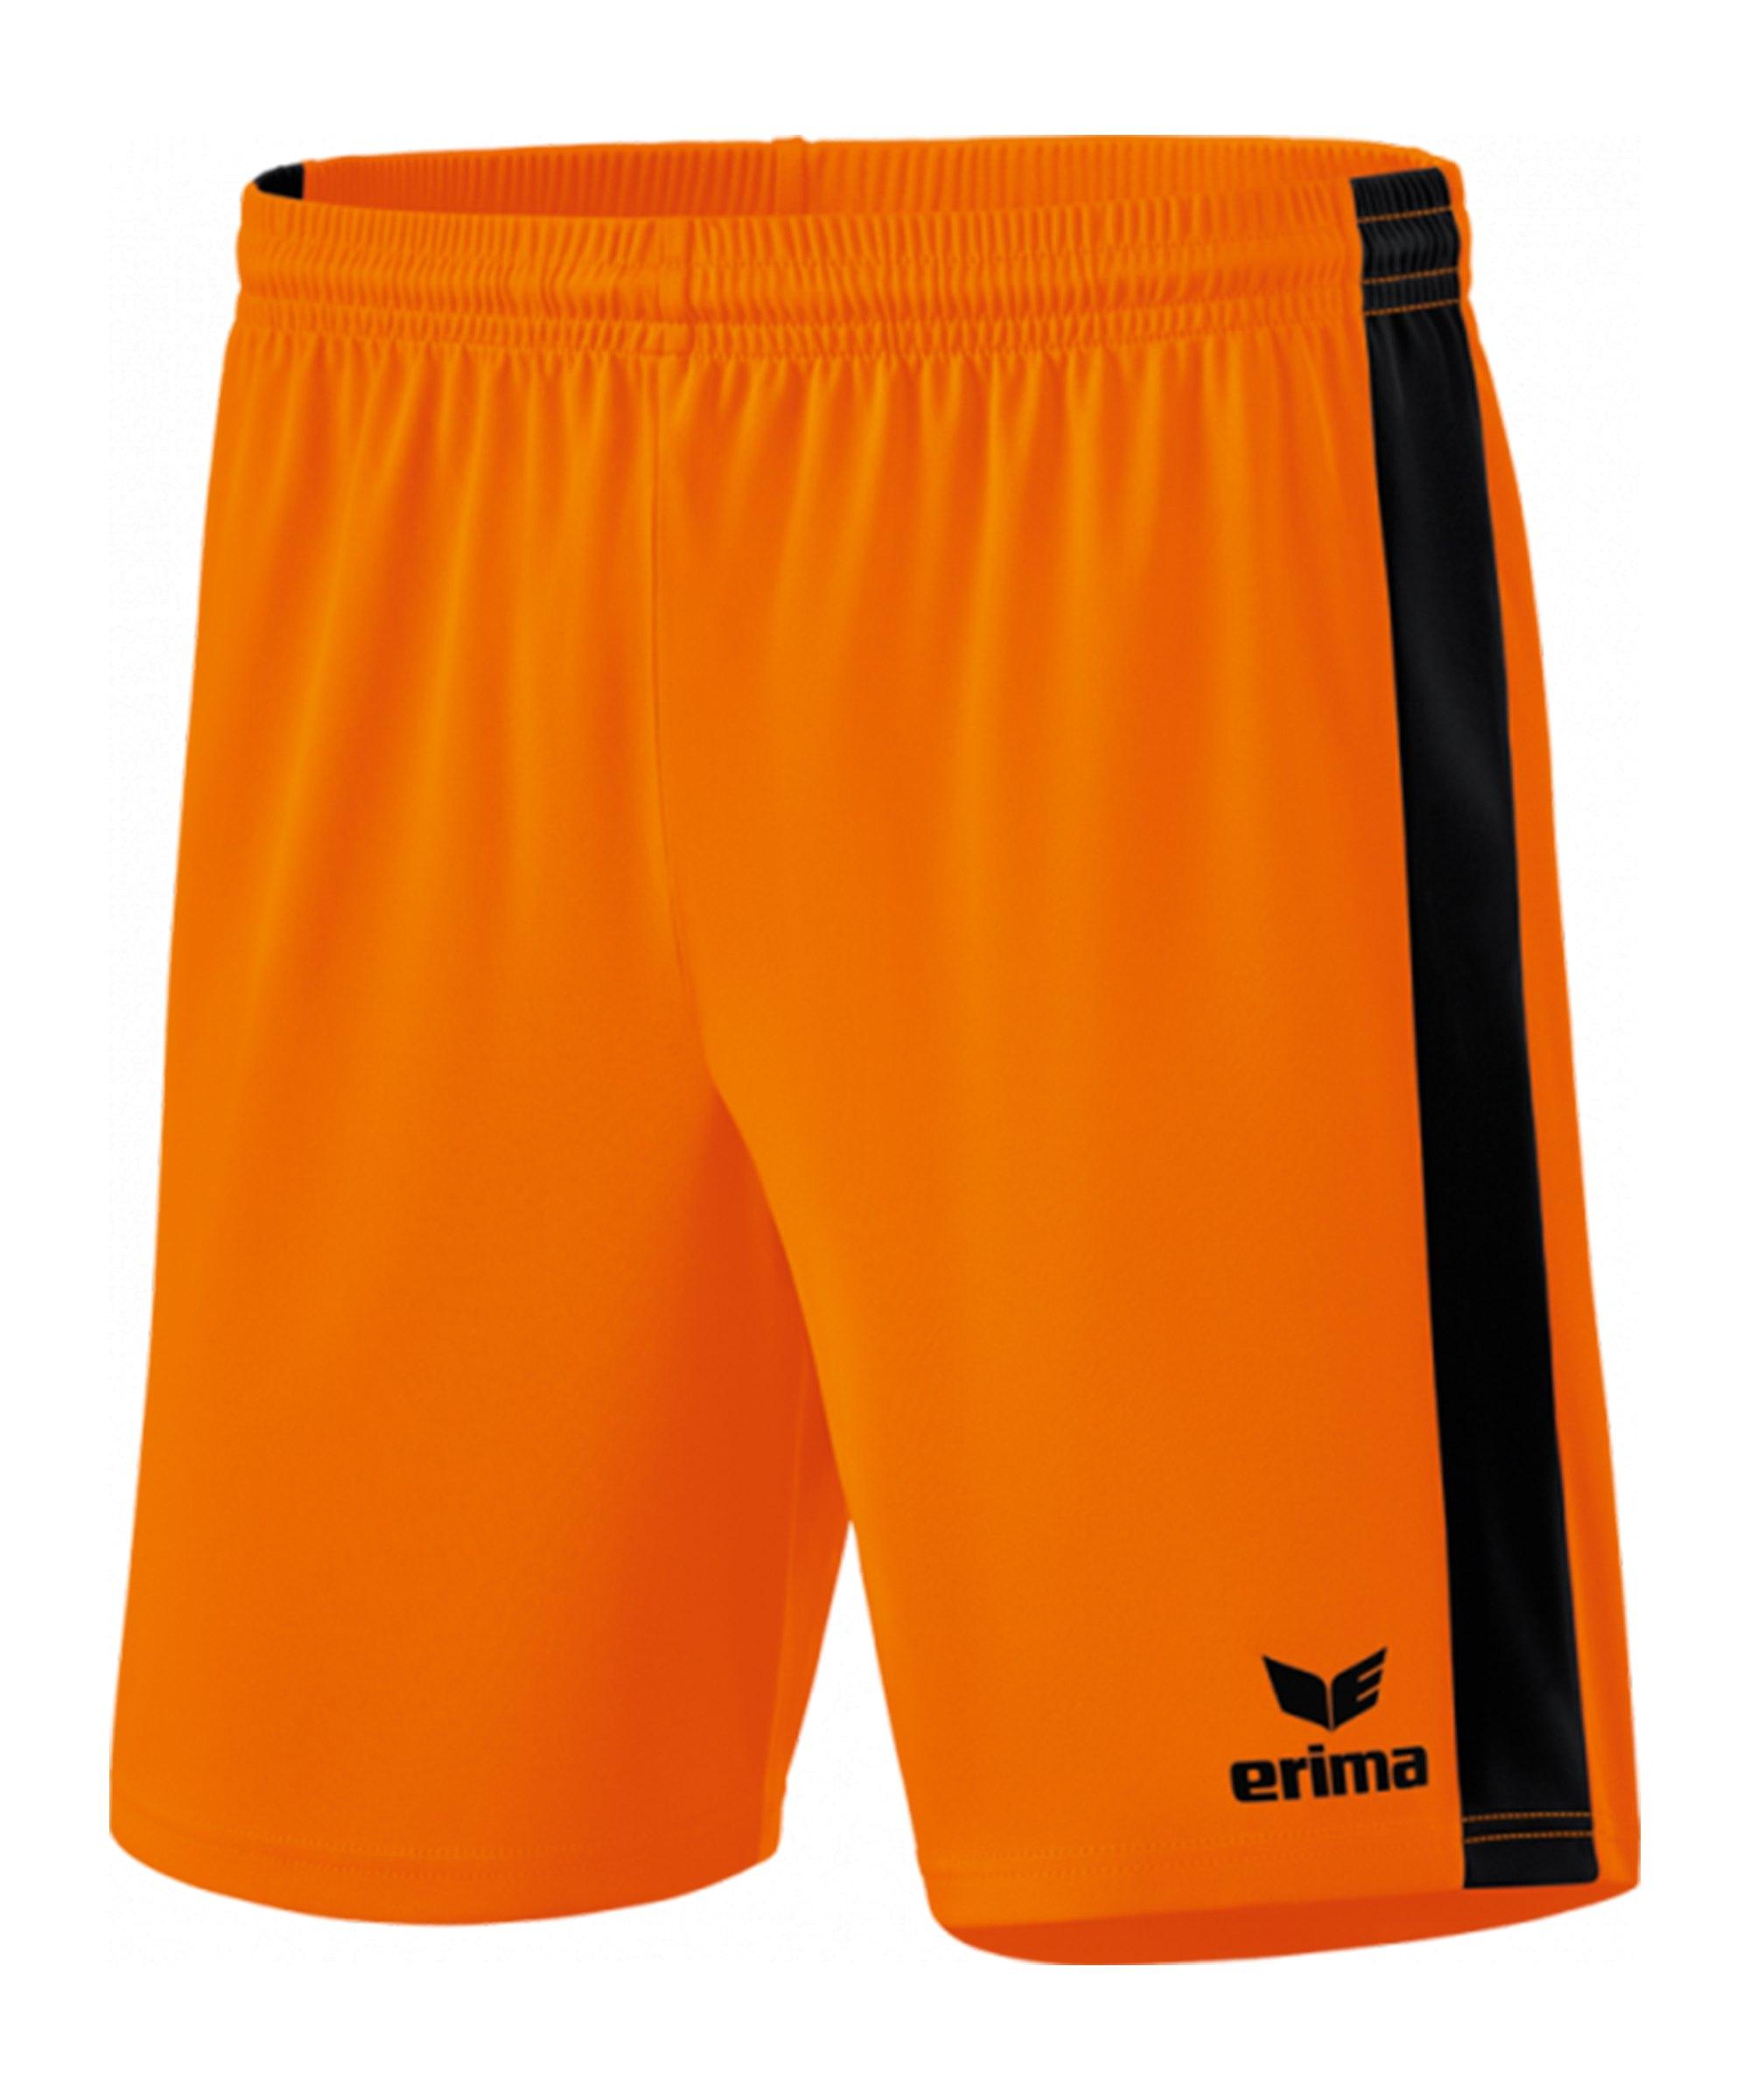 Erima Retro Star Short Kids Orange Schwarz - orange